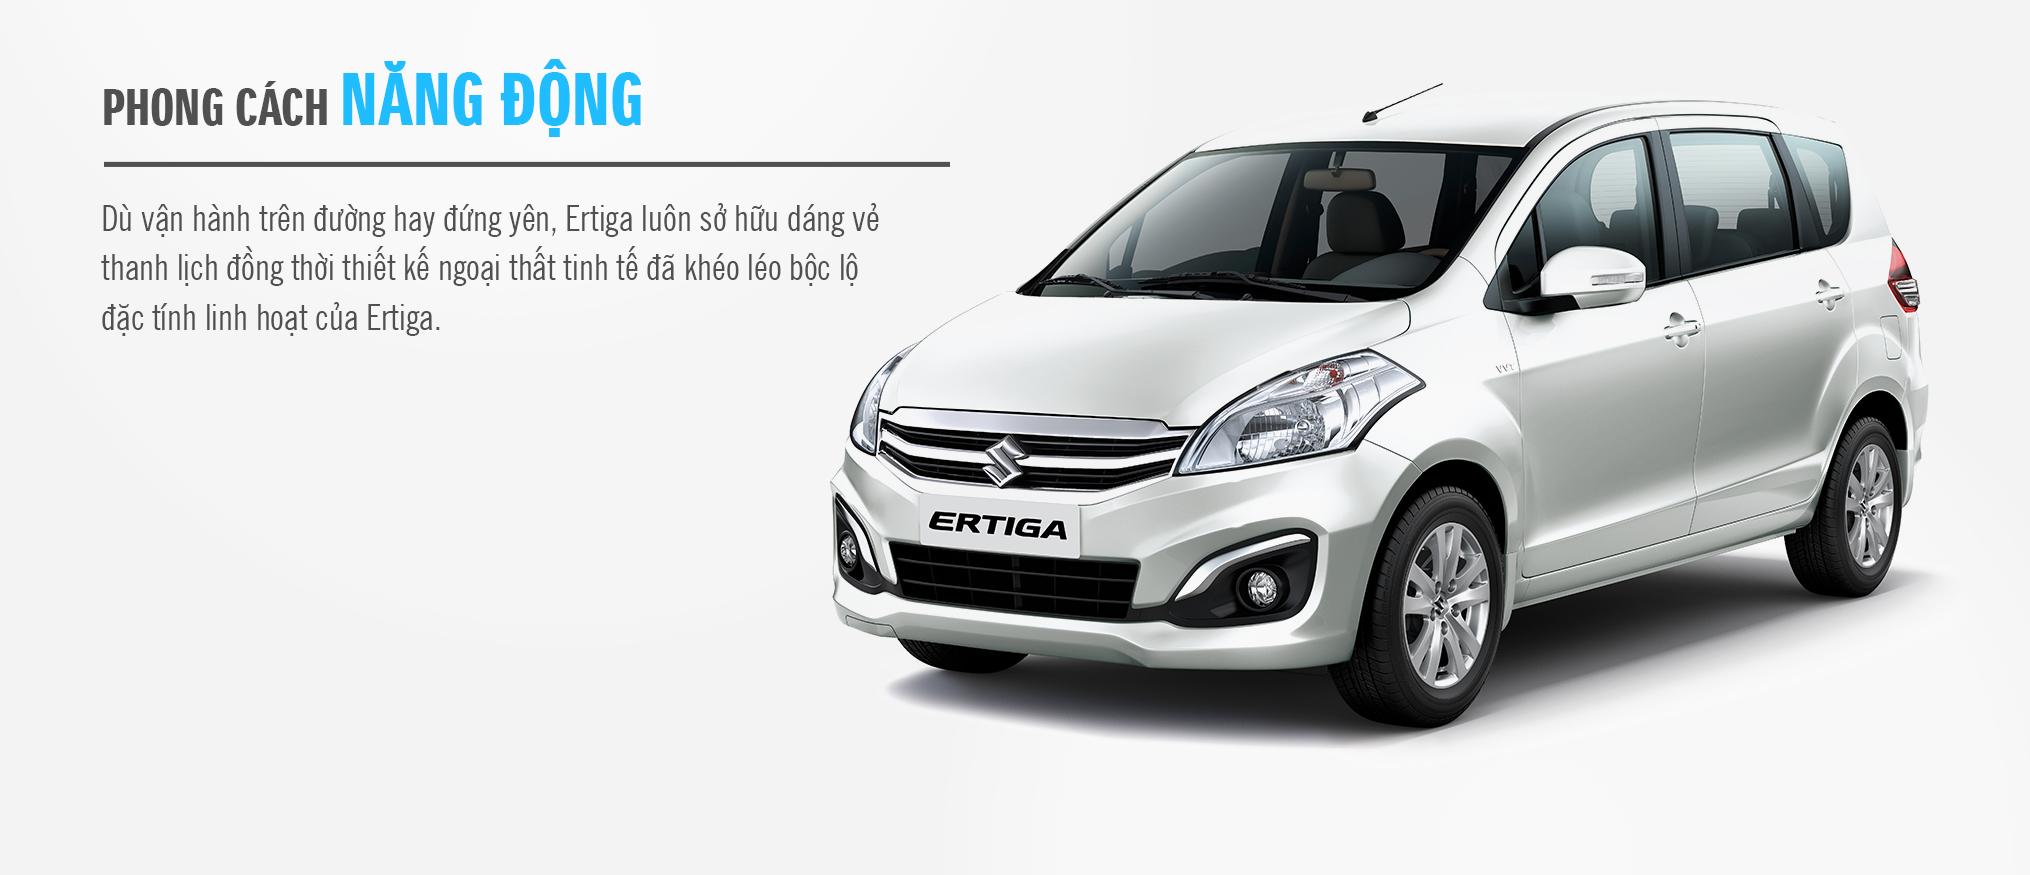 Suzuki Ertiga 07 chỗ 2016  - Nhập khẩu từ Indonesia